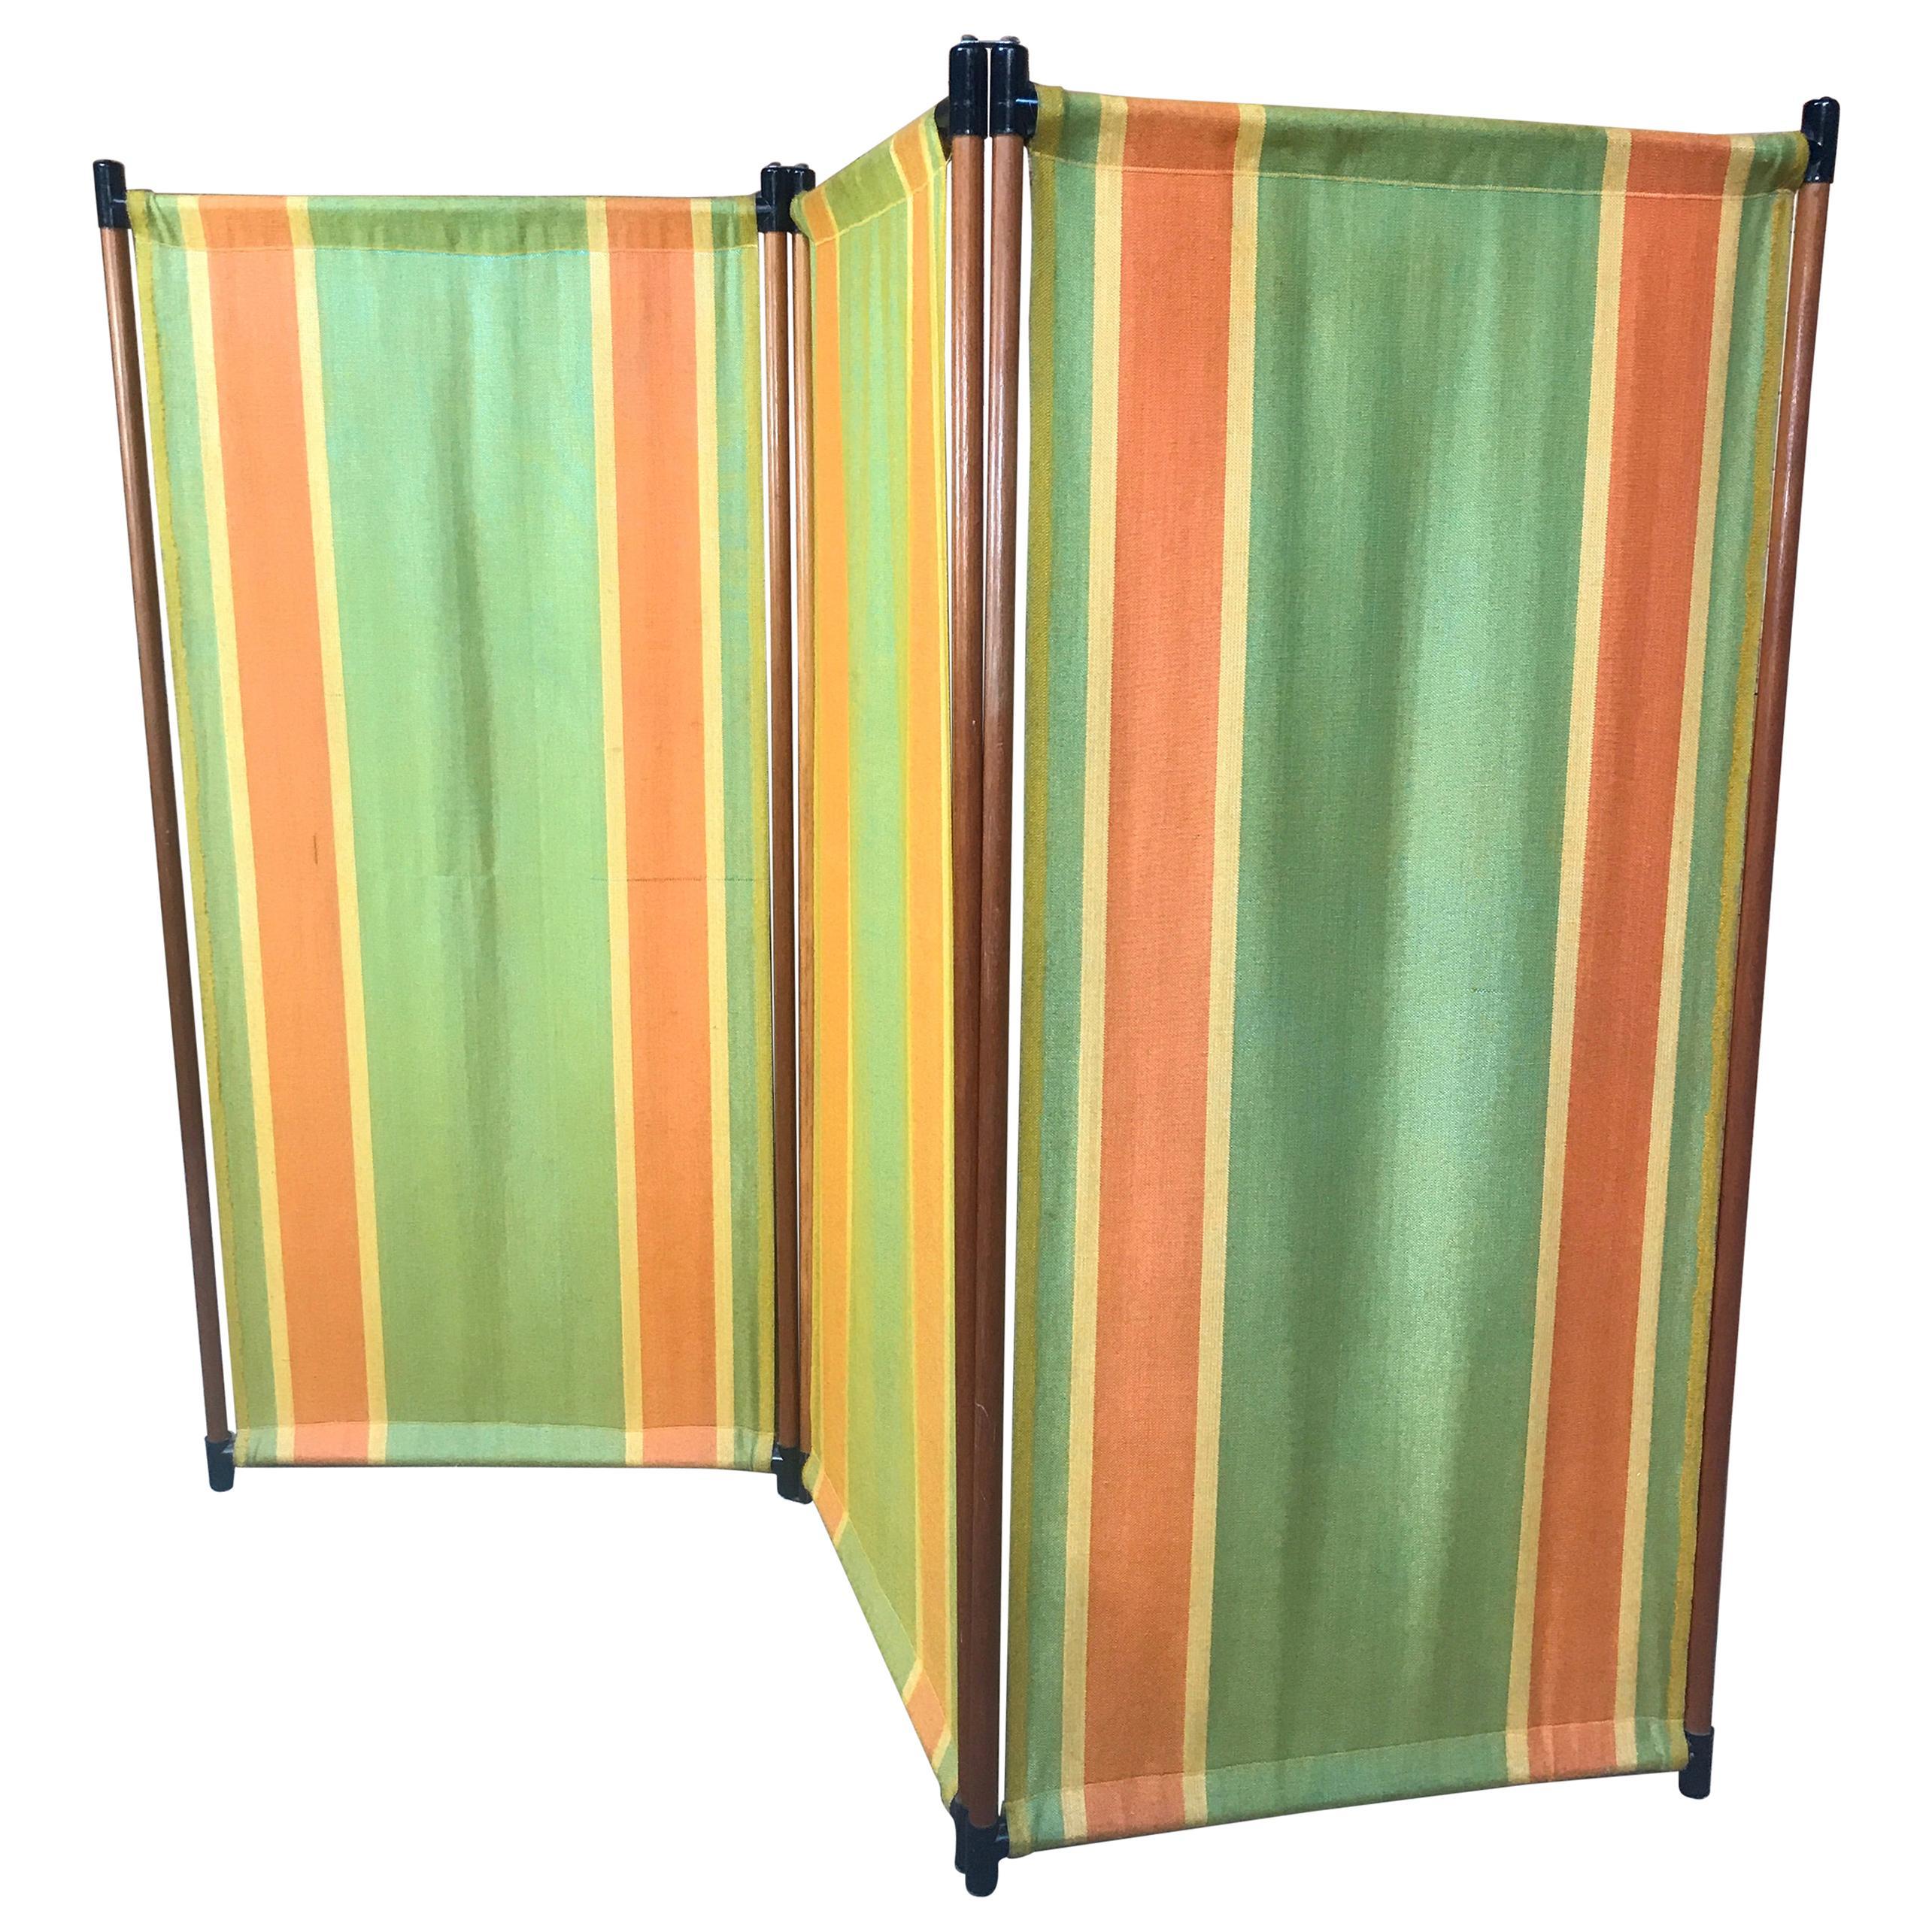 1960 Retro Vintage Fabric screen / Room Divider